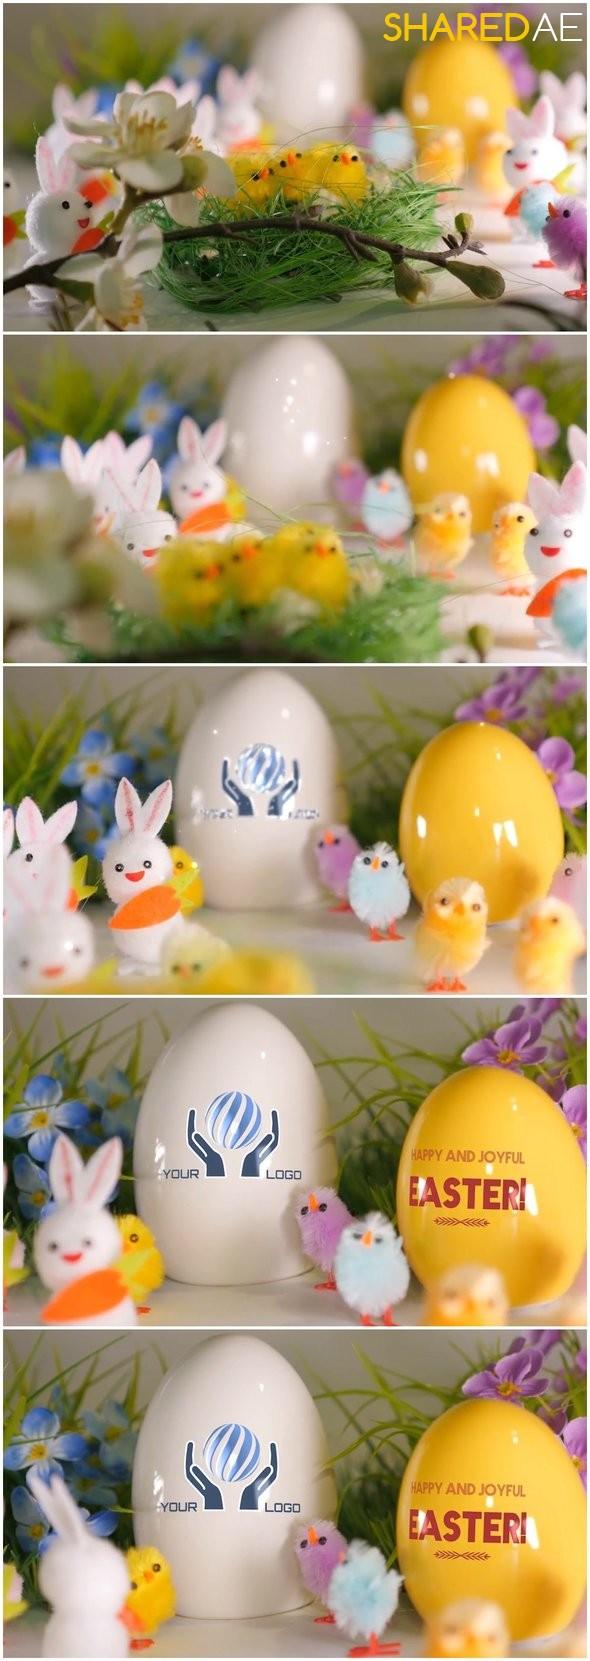 Videohive - Easter Greetings 19728126